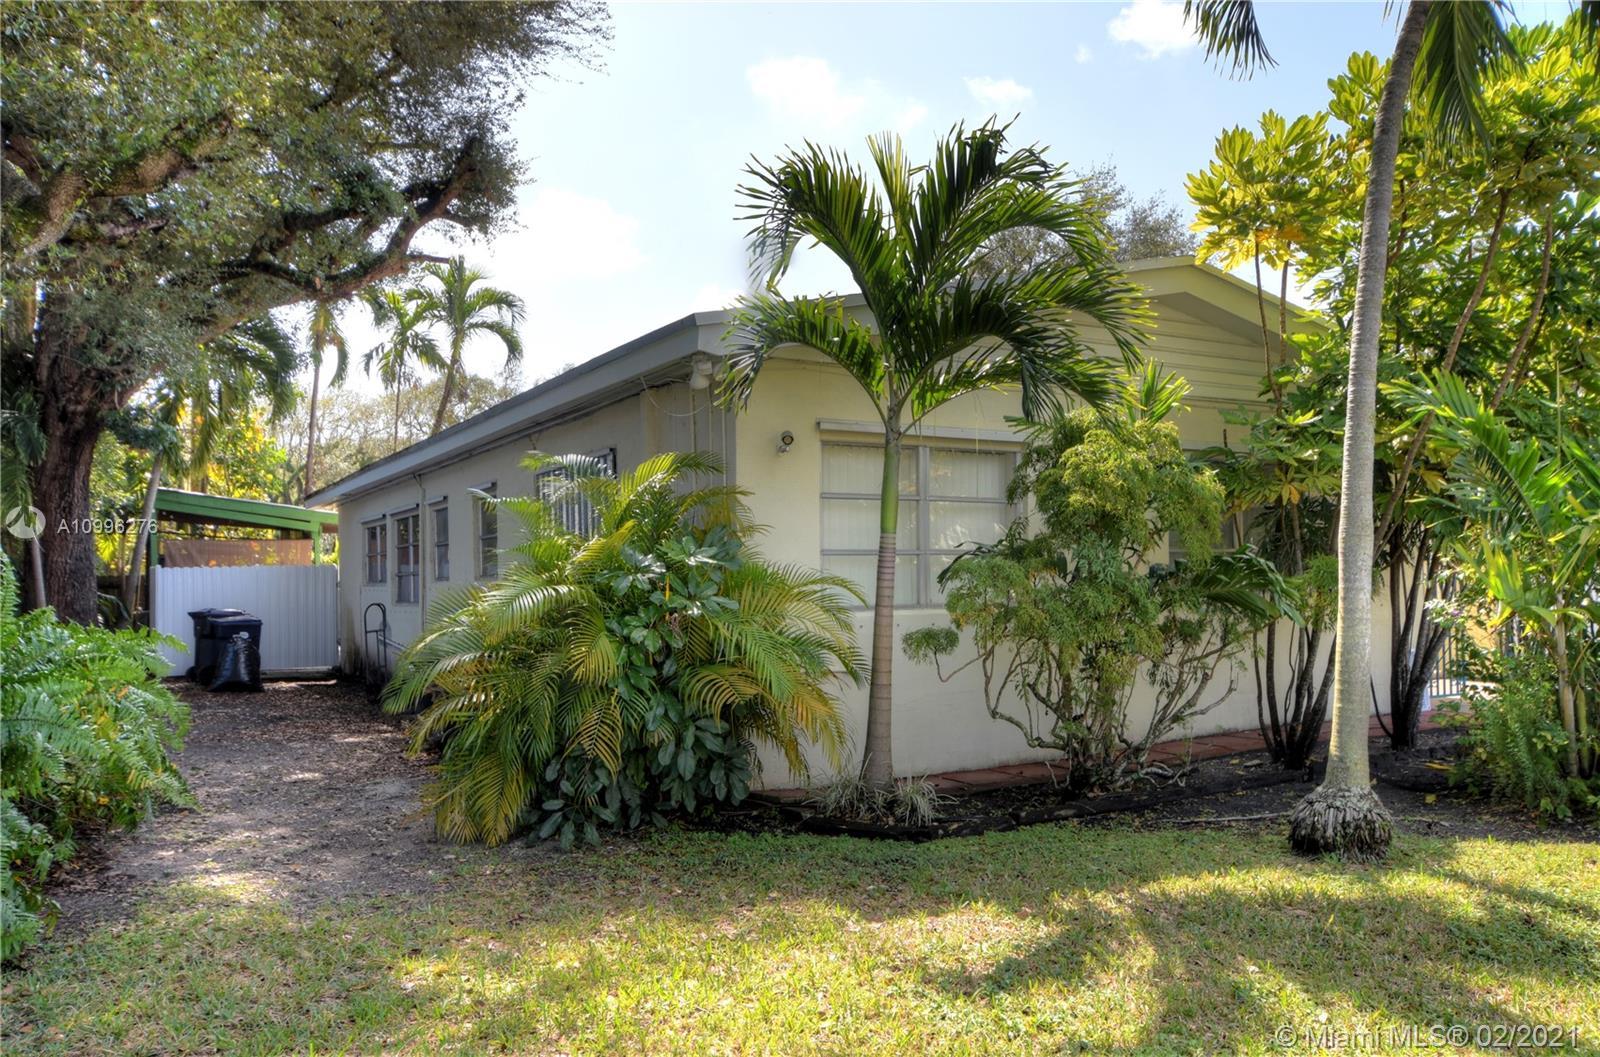 Sky Lake, 2110 NE 191st Dr, North Miami Beach, Florida 33179, image 36